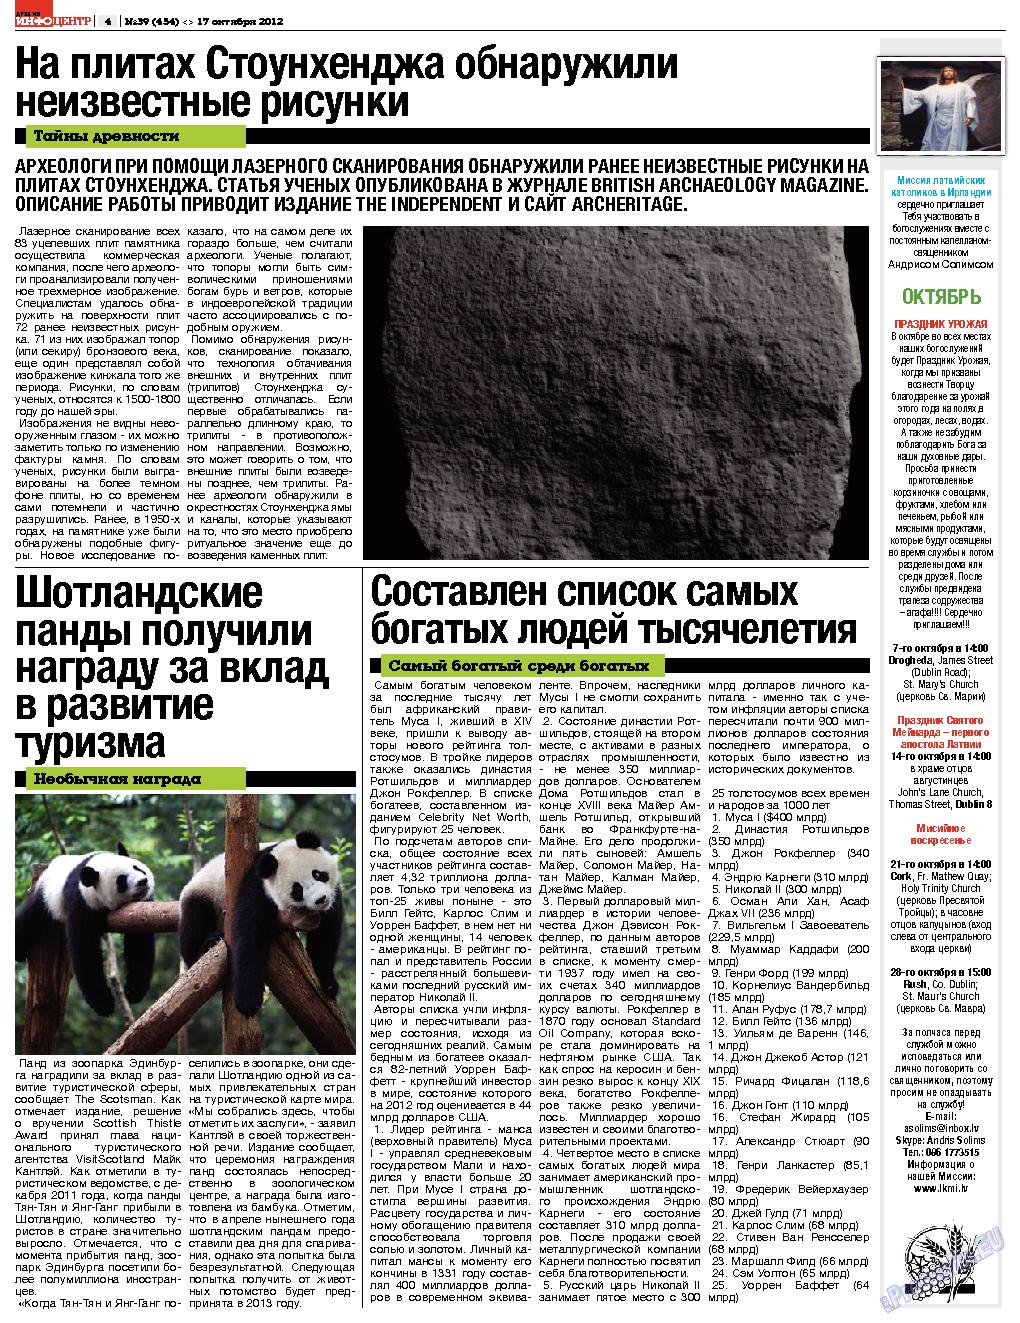 Дублин инфоцентр (газета). 2012 год, номер 38, стр. 4